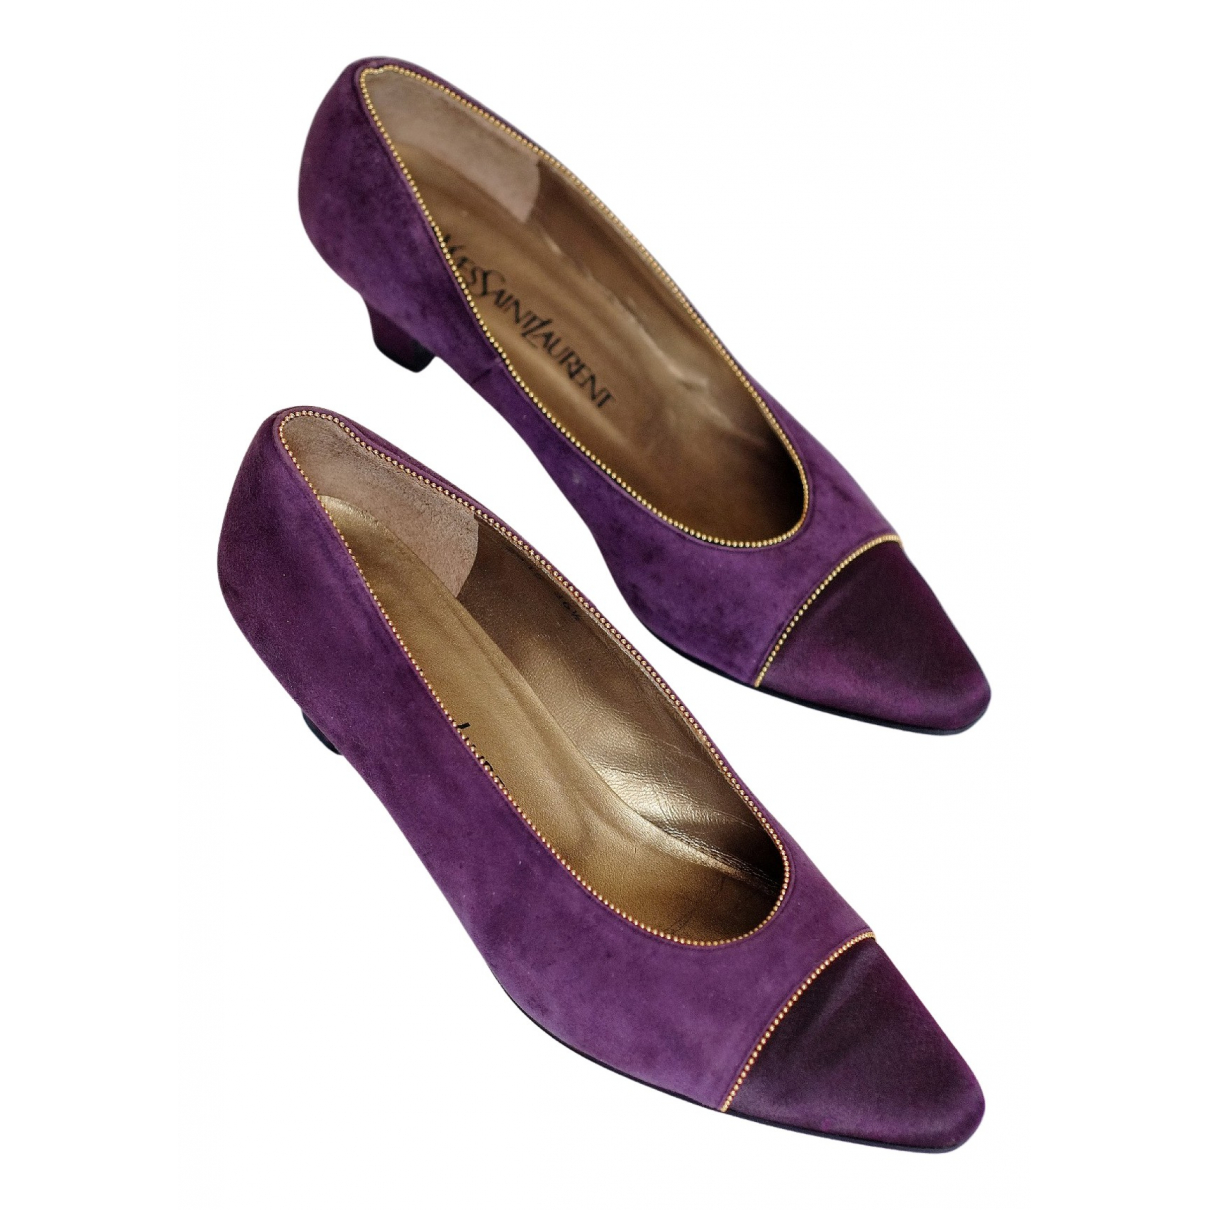 Yves Saint Laurent N Purple Suede Heels for Women 36.5 EU